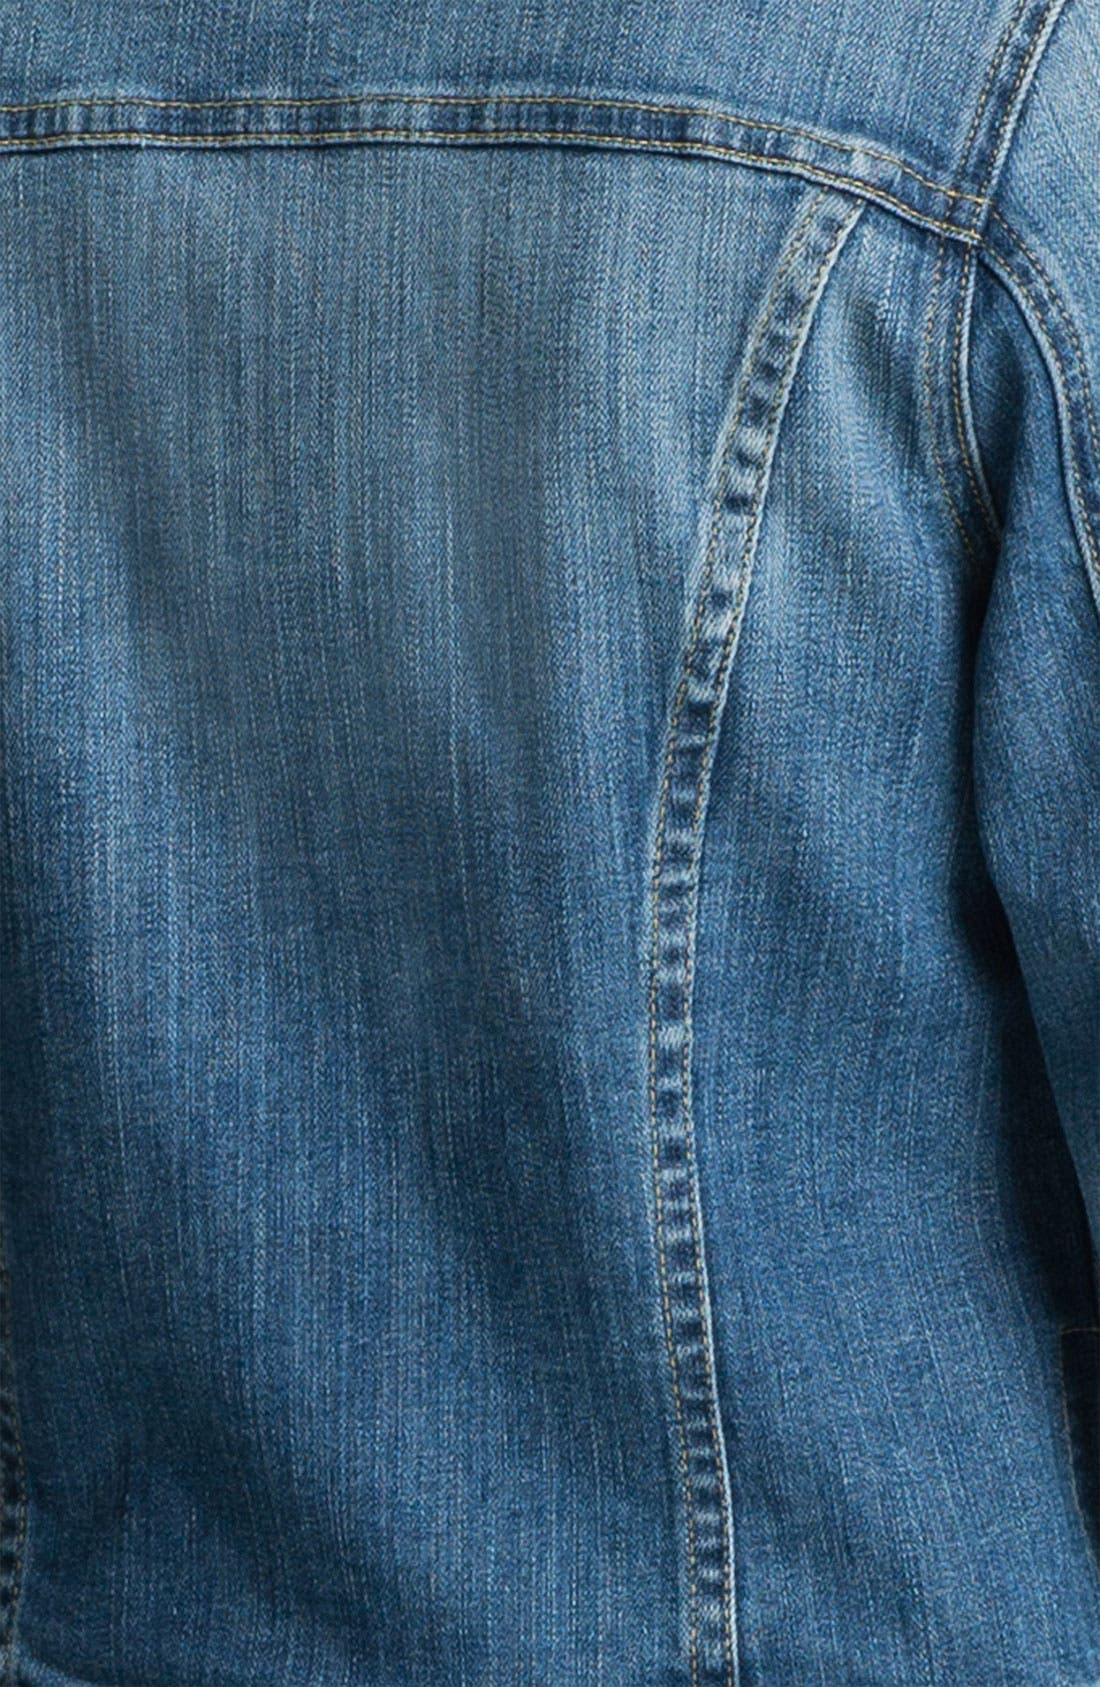 'Robyn' Denim Jacket,                             Alternate thumbnail 3, color,                             400